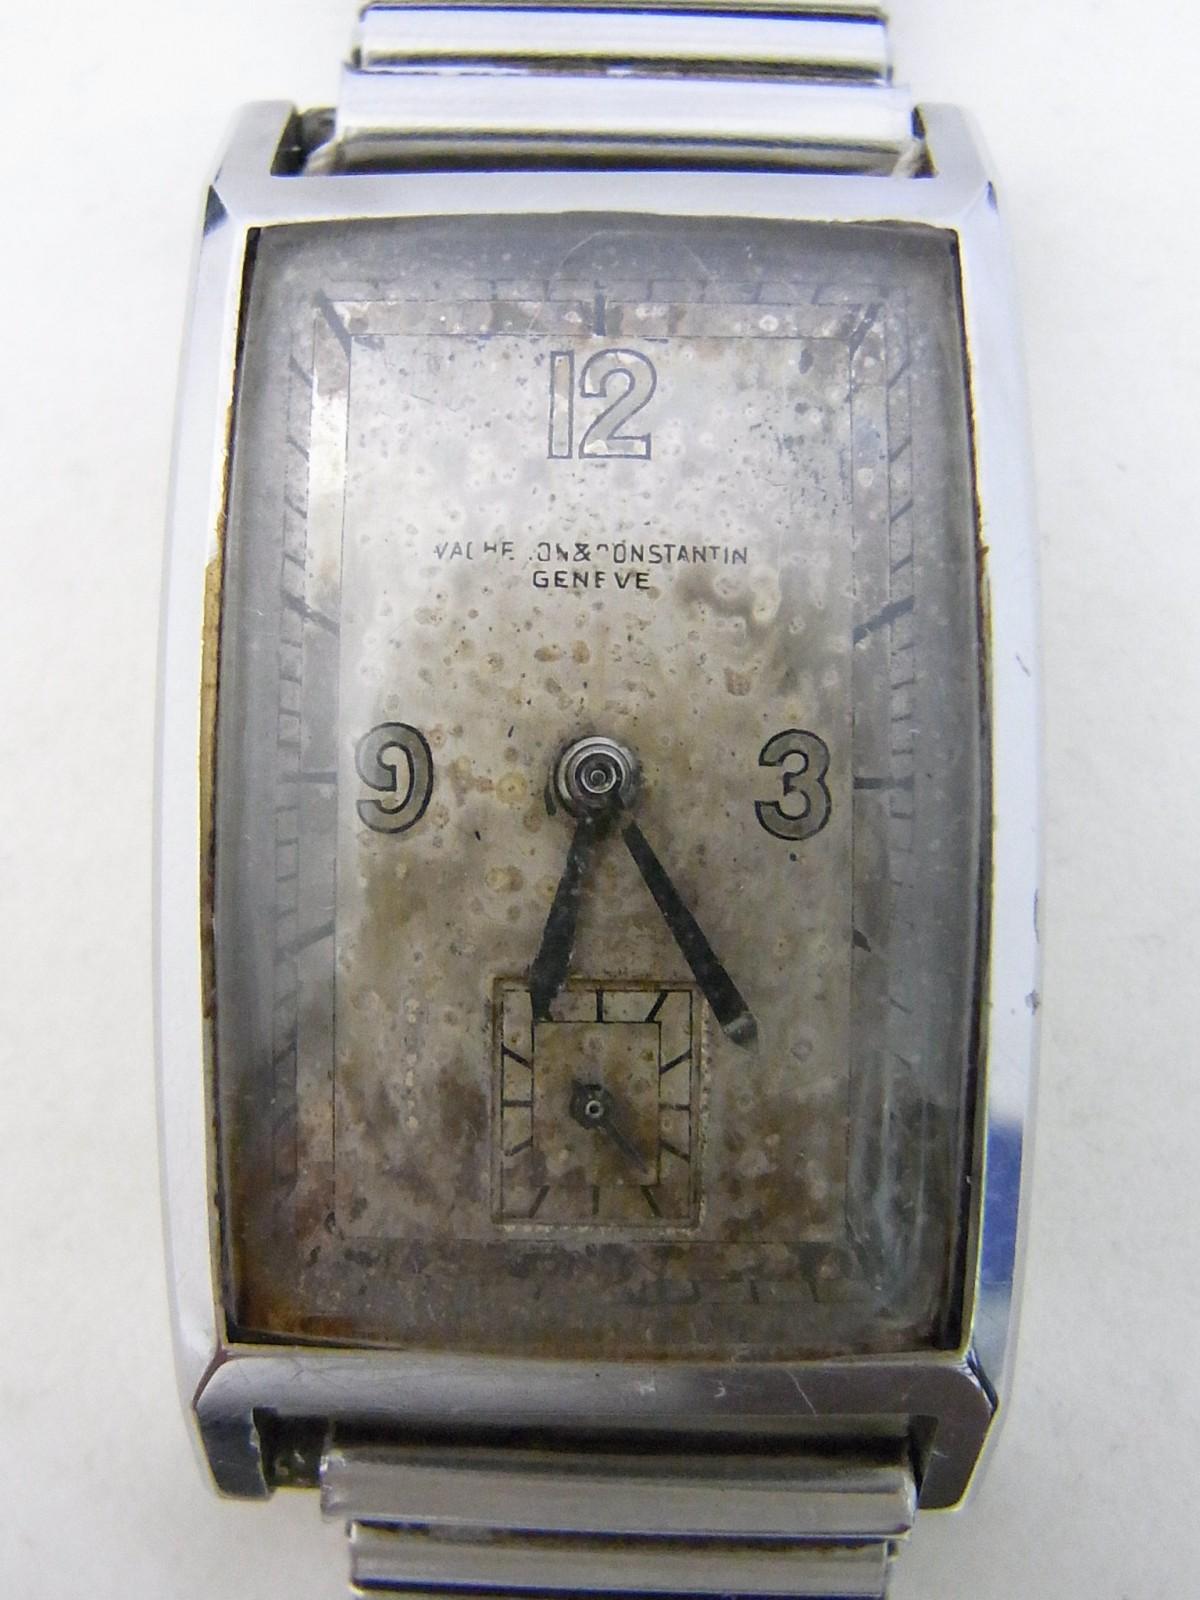 5f01dfe513a Vacheron Constantin antique relógio usados (€92) - Timepeaks